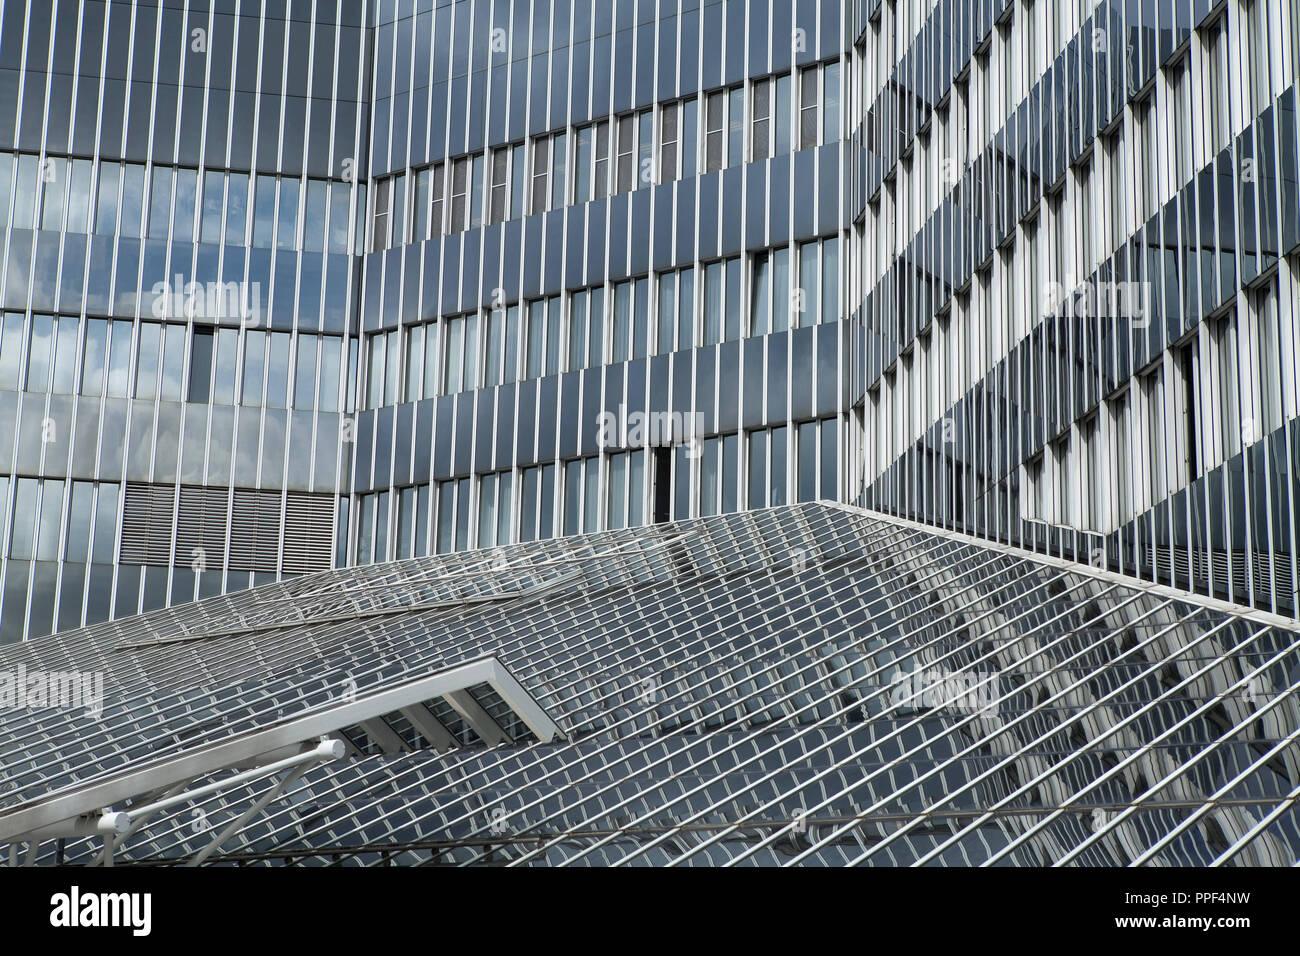 Fiz Bmw Munich Research Innovation Stock Photos Fiz Bmw Munich